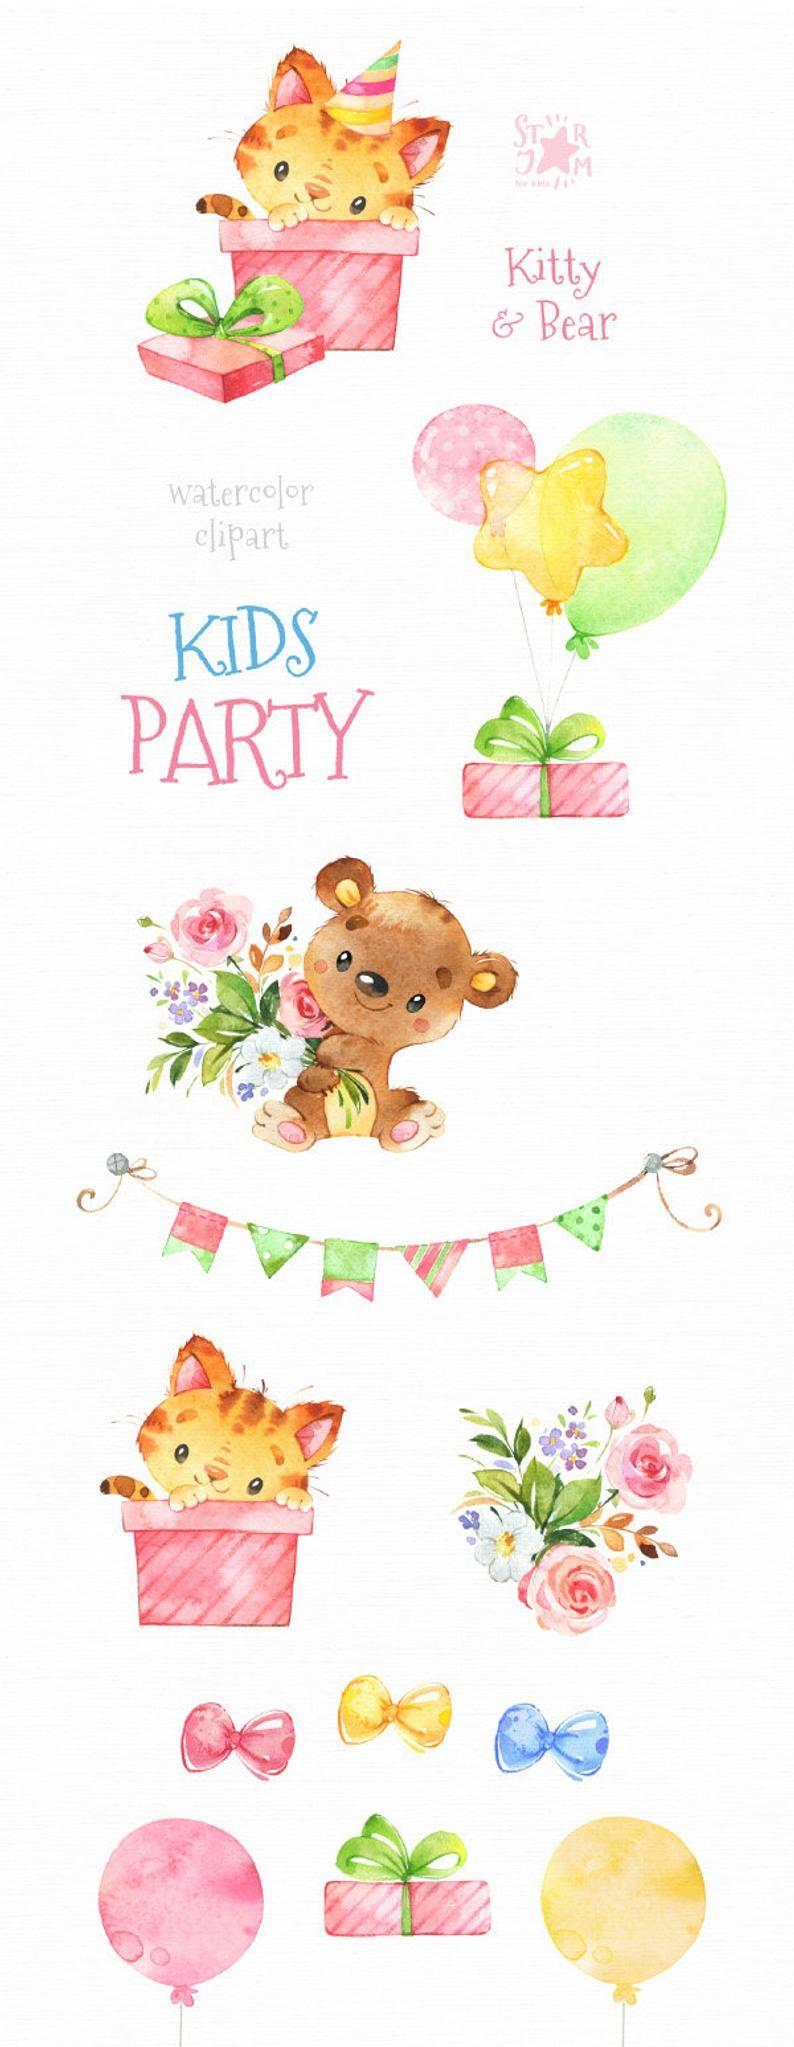 Kids Party 3 Kitty & Bear Watercolor little animal Birthday | Etsy